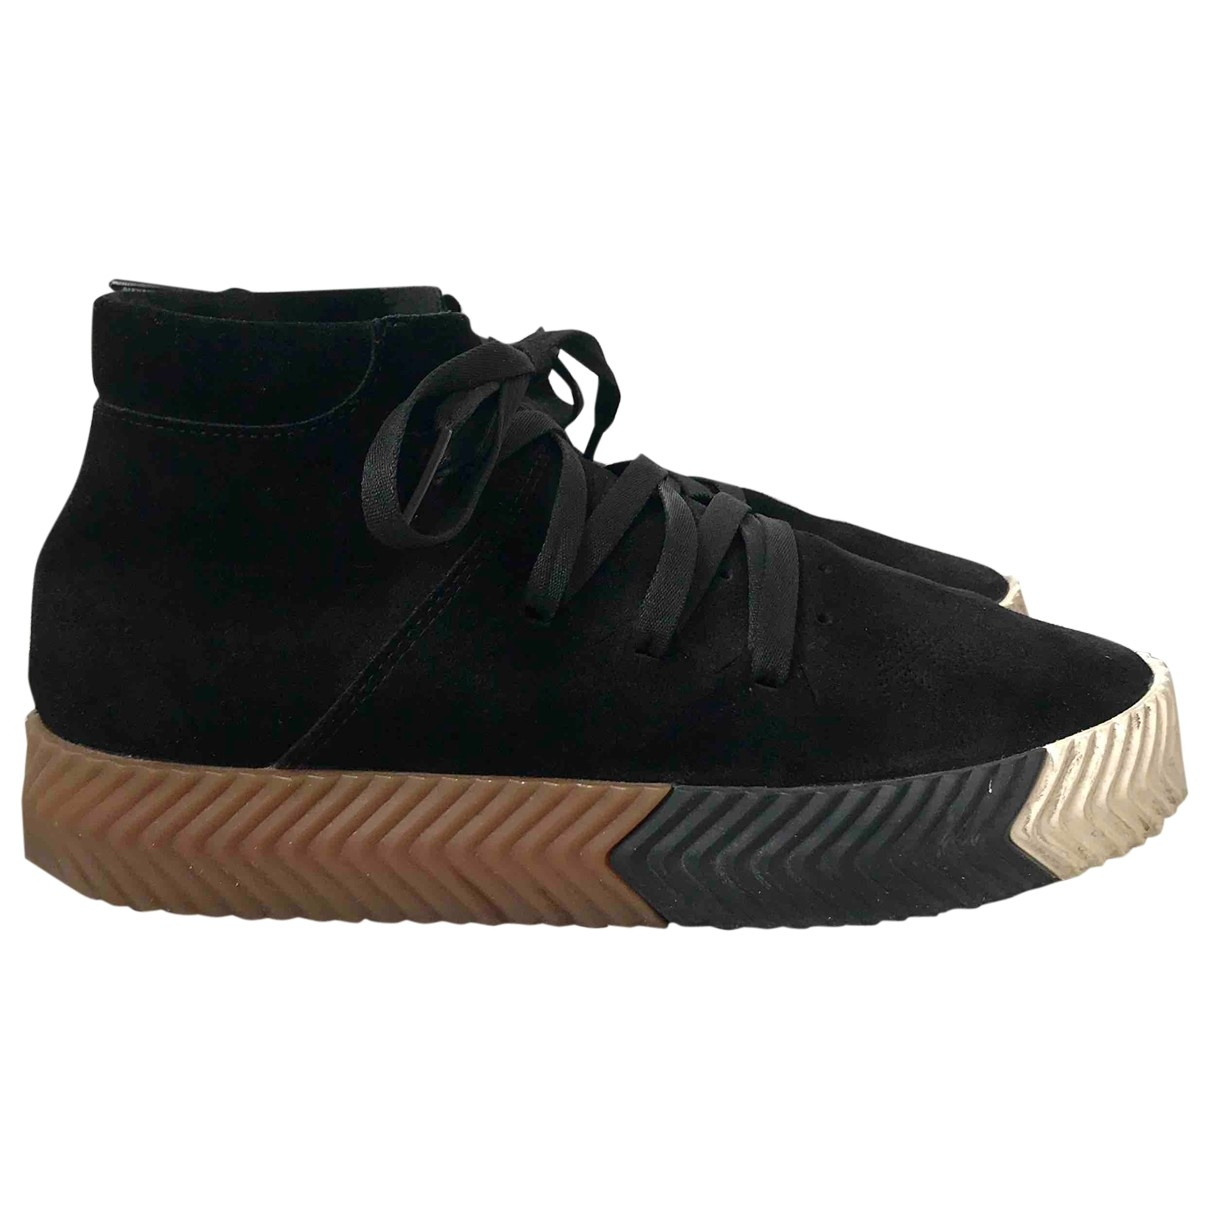 Adidas Originals X Alexander Wang \N Black Suede Trainers for Men 6 UK